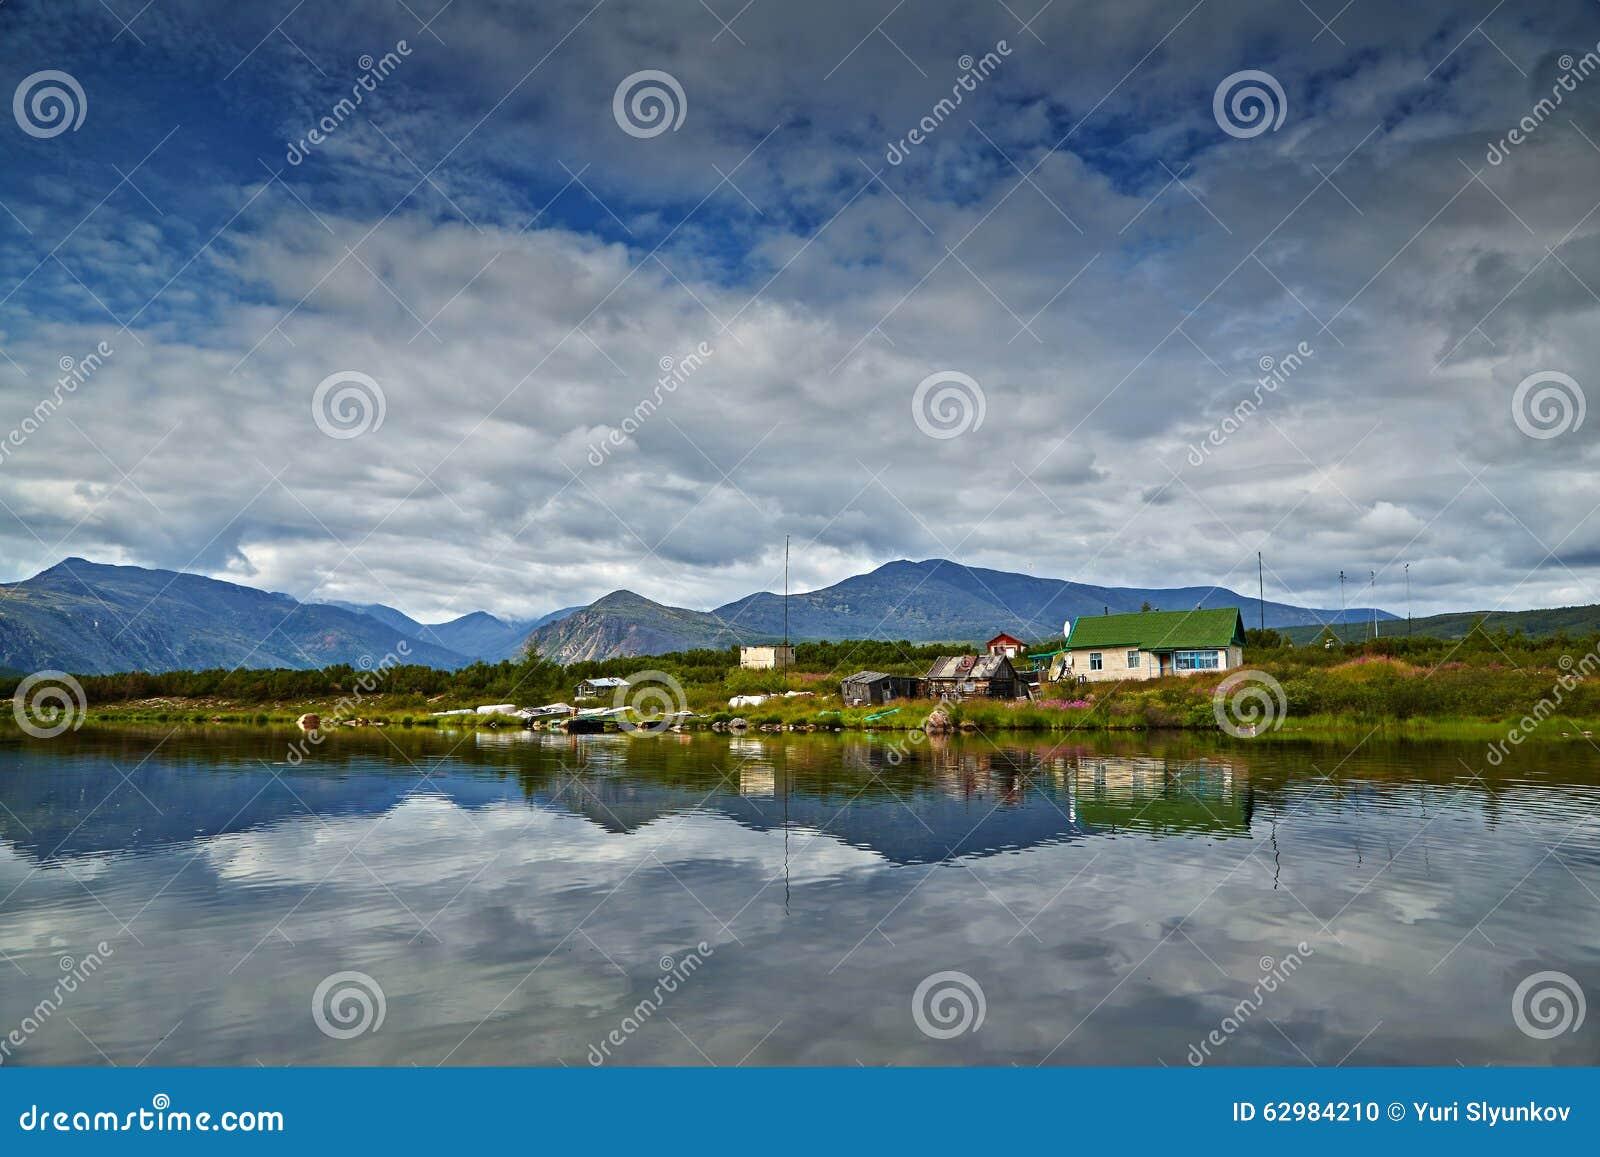 Jack London s lake. Small house on island. reflexions